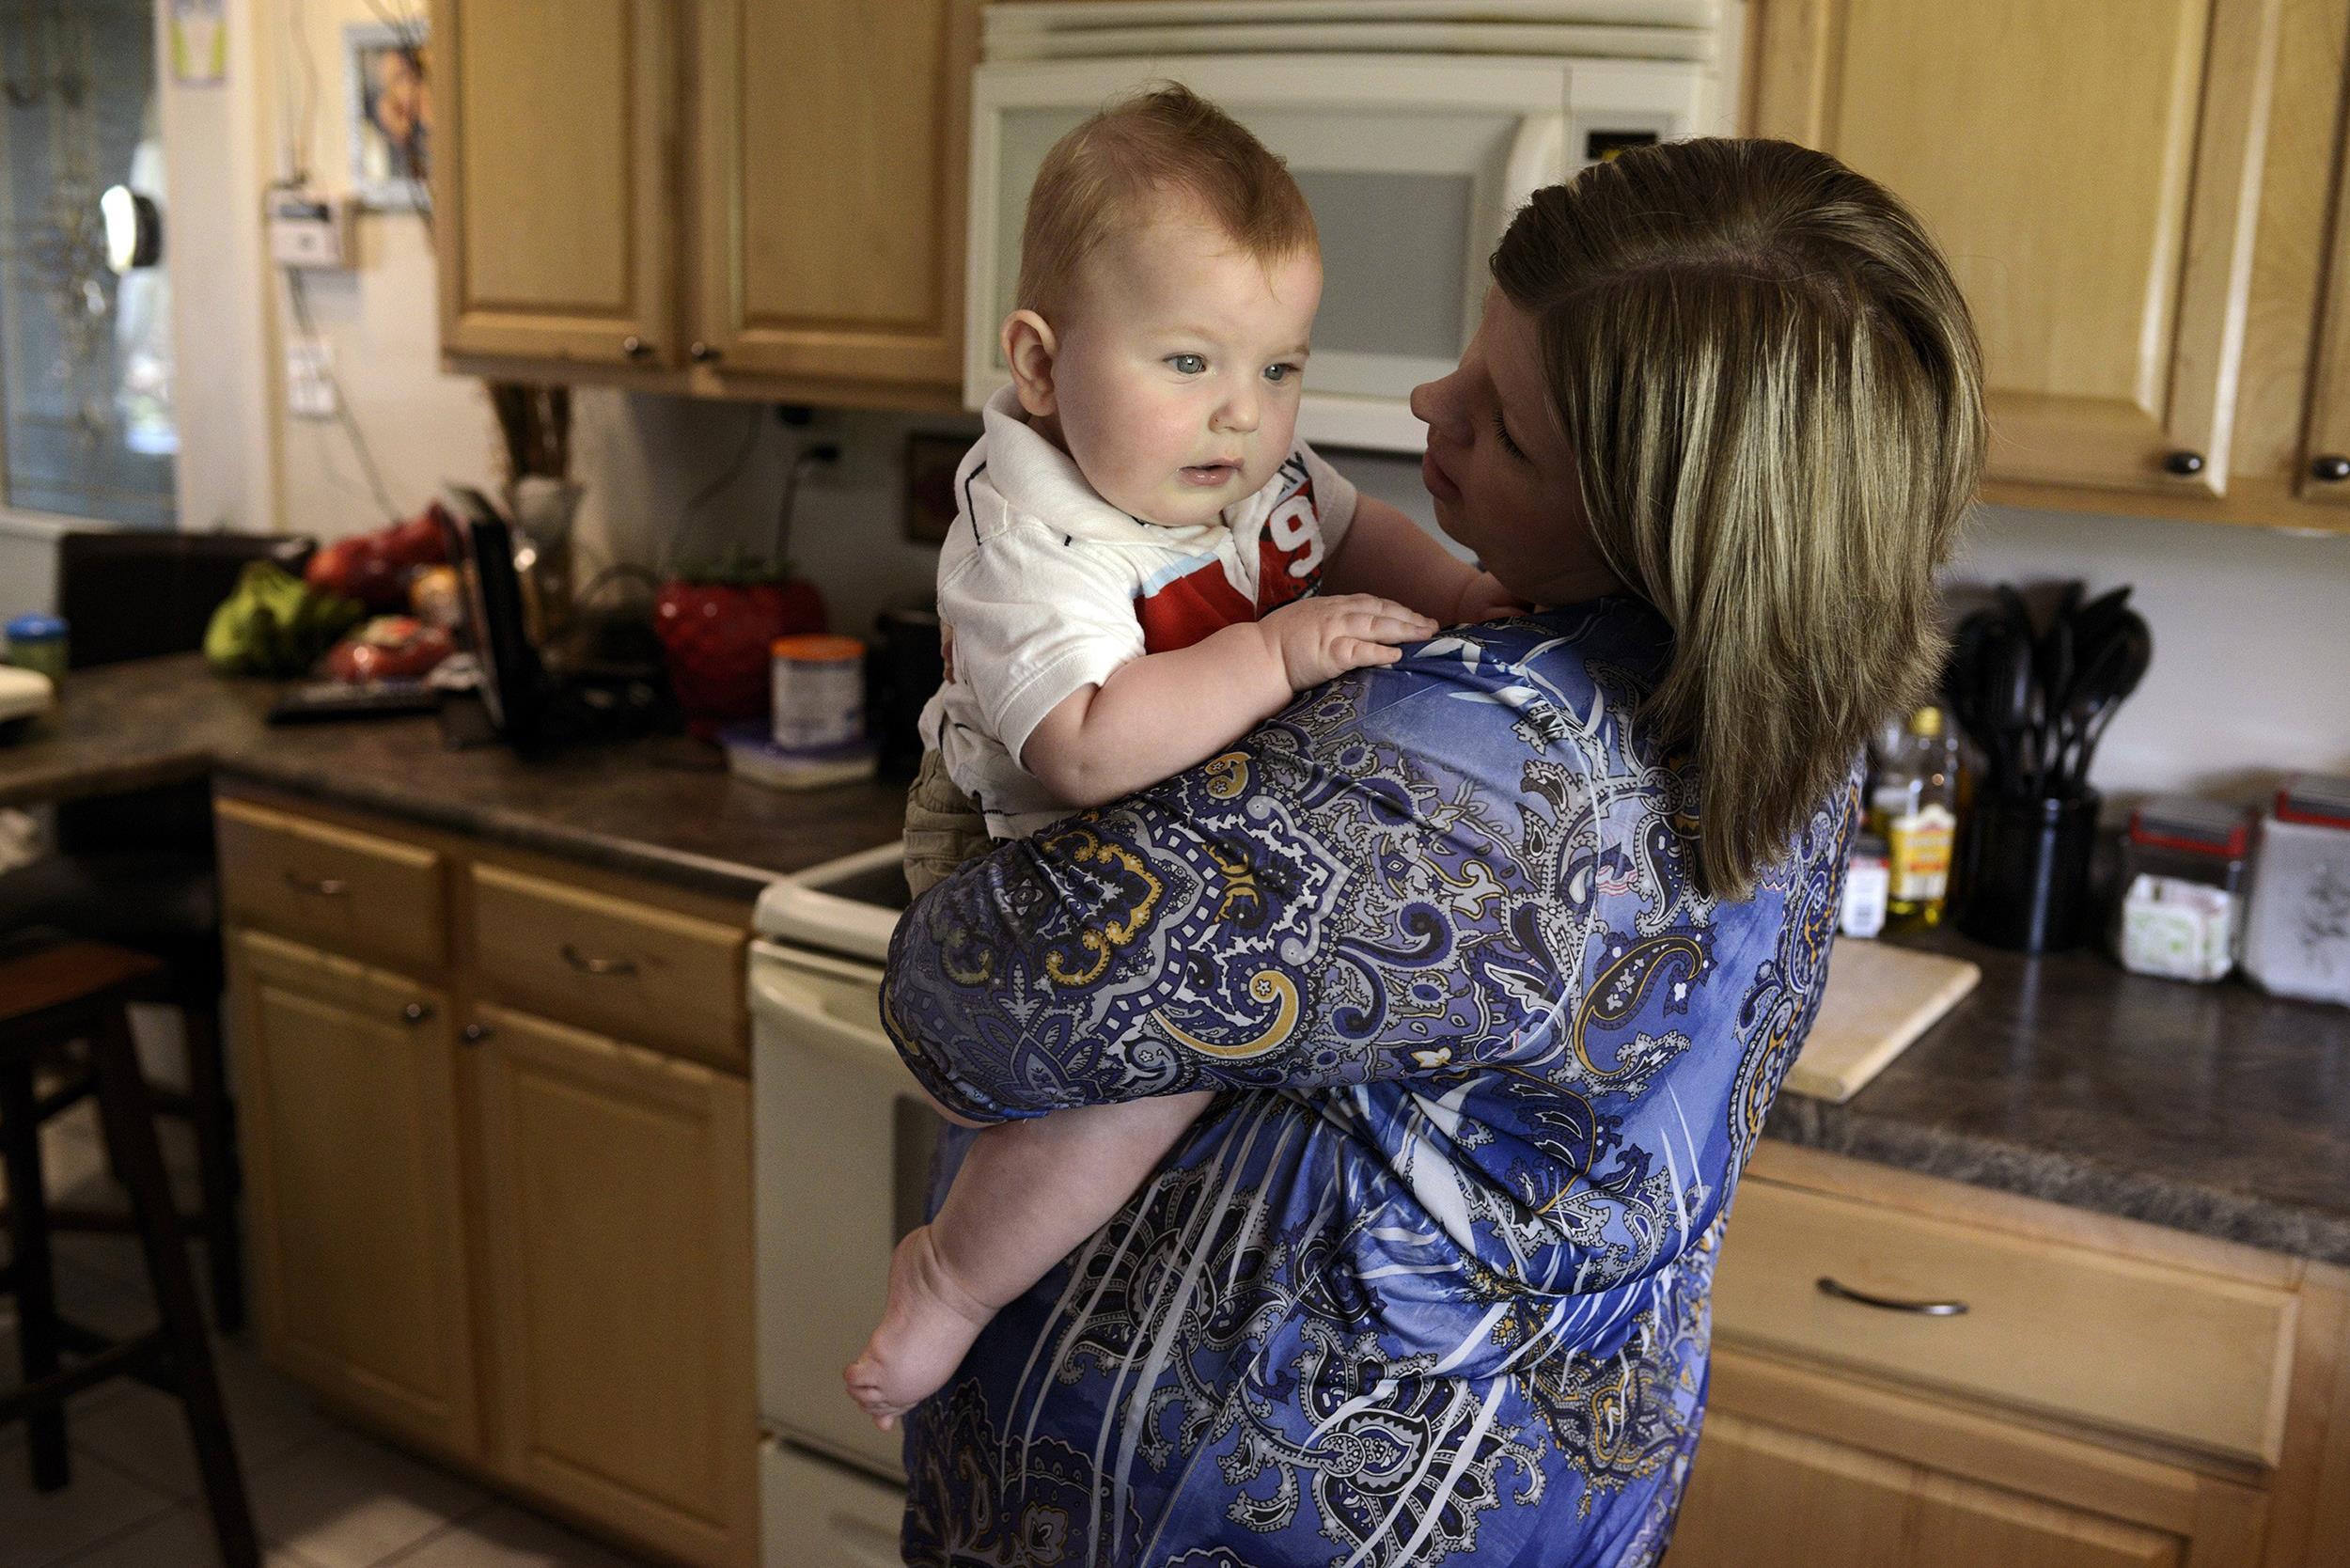 Image: Jenessa Moman holds her son Landyn Rich, 9 months